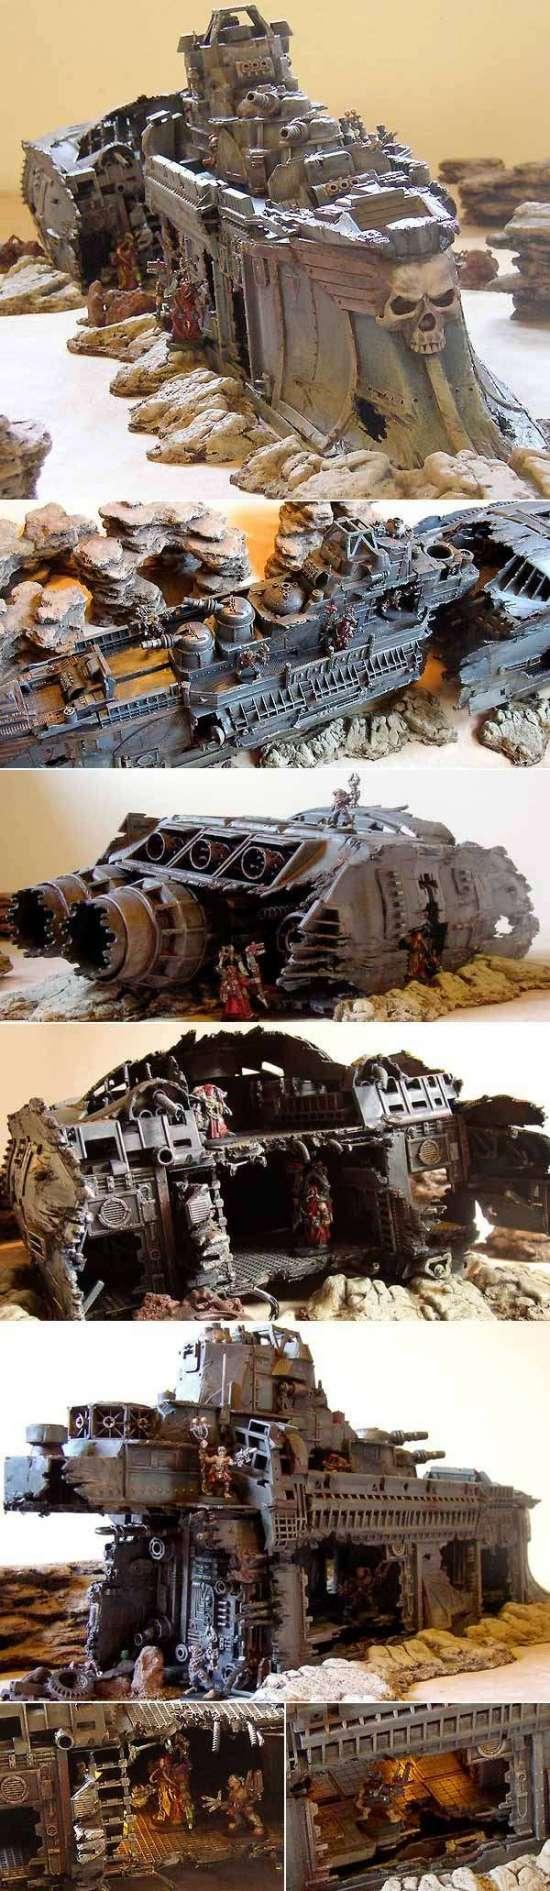 Wreck of the Dauntless